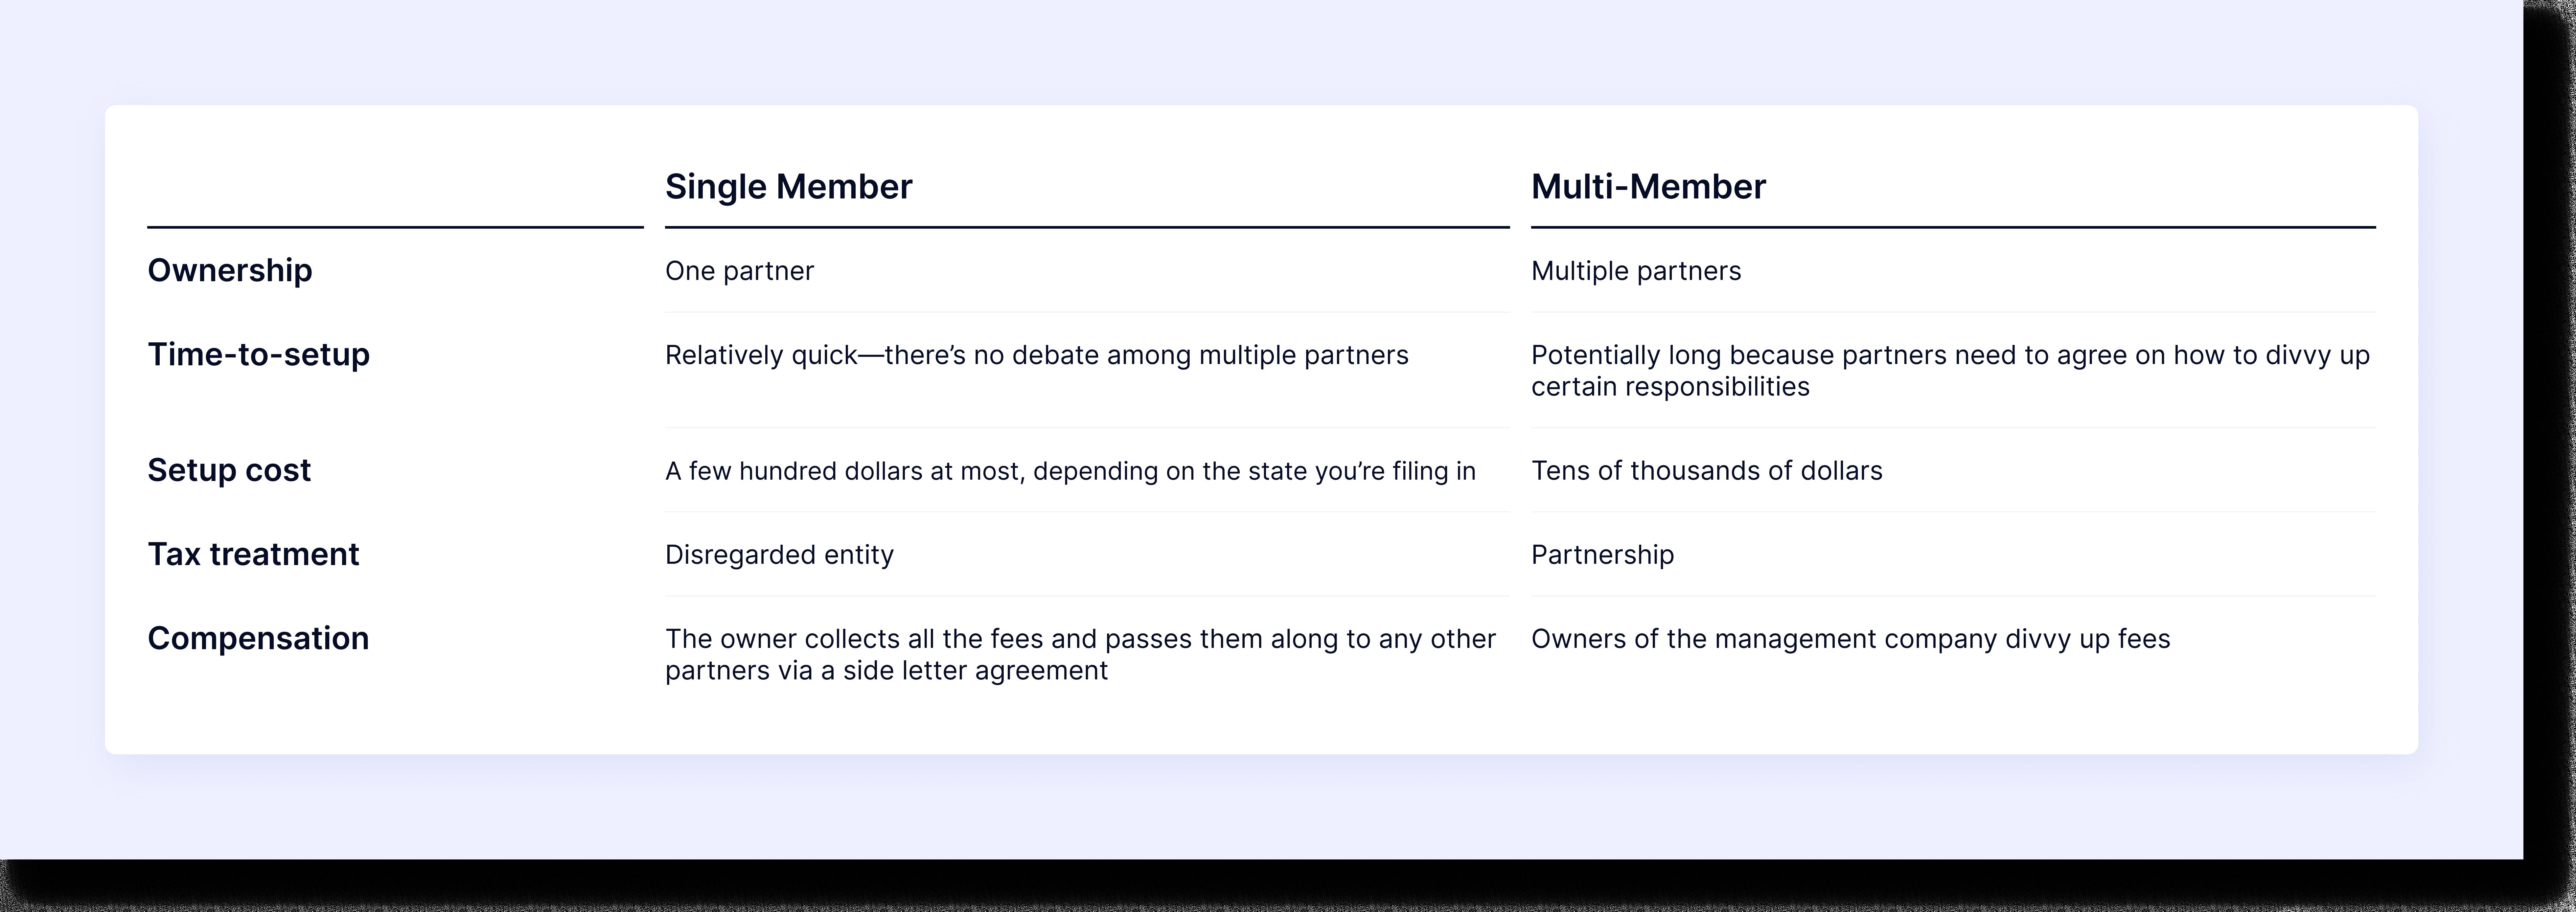 single member vs. multi-member management company